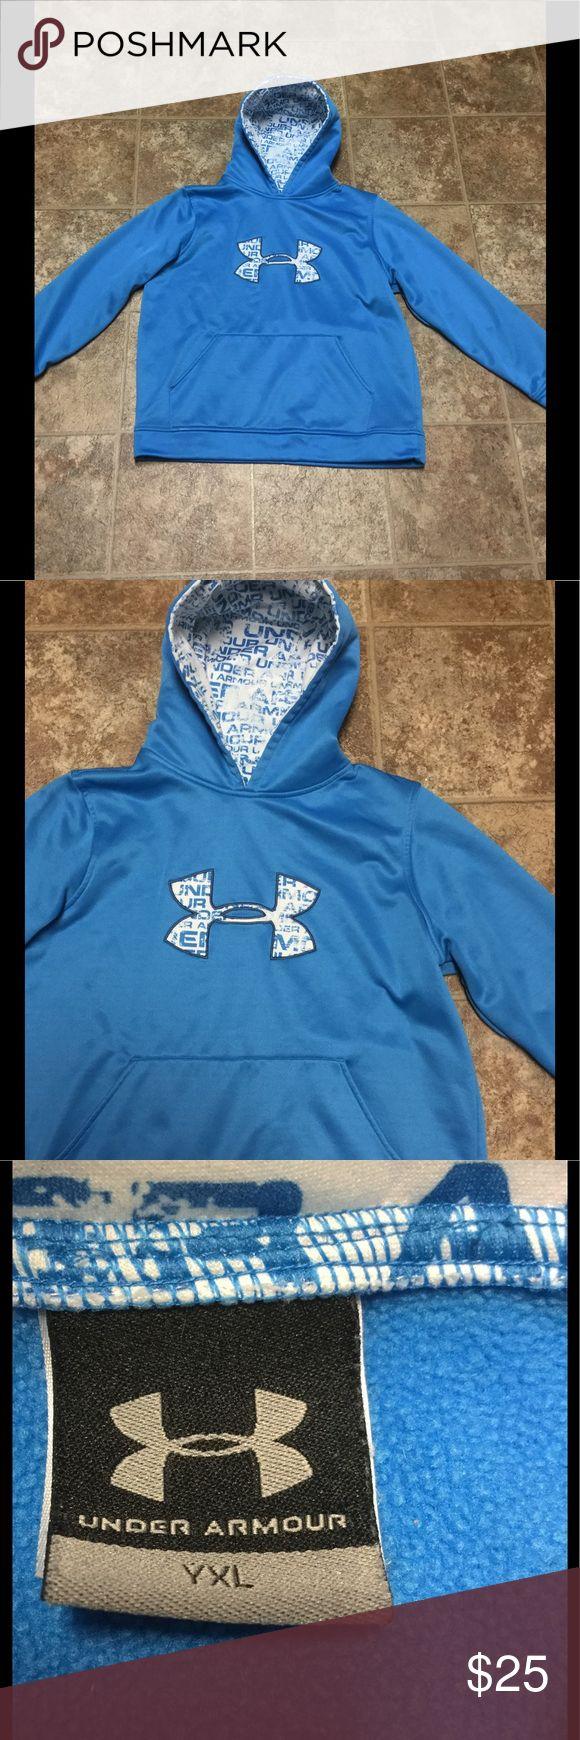 Under Armour Sweatshirt Hoodie Size YLG NWOT Under Armour Blue Sweatshirt Hoodie Size YLG NWOT Under Armour Shirts & Tops Sweatshirts & Hoodies